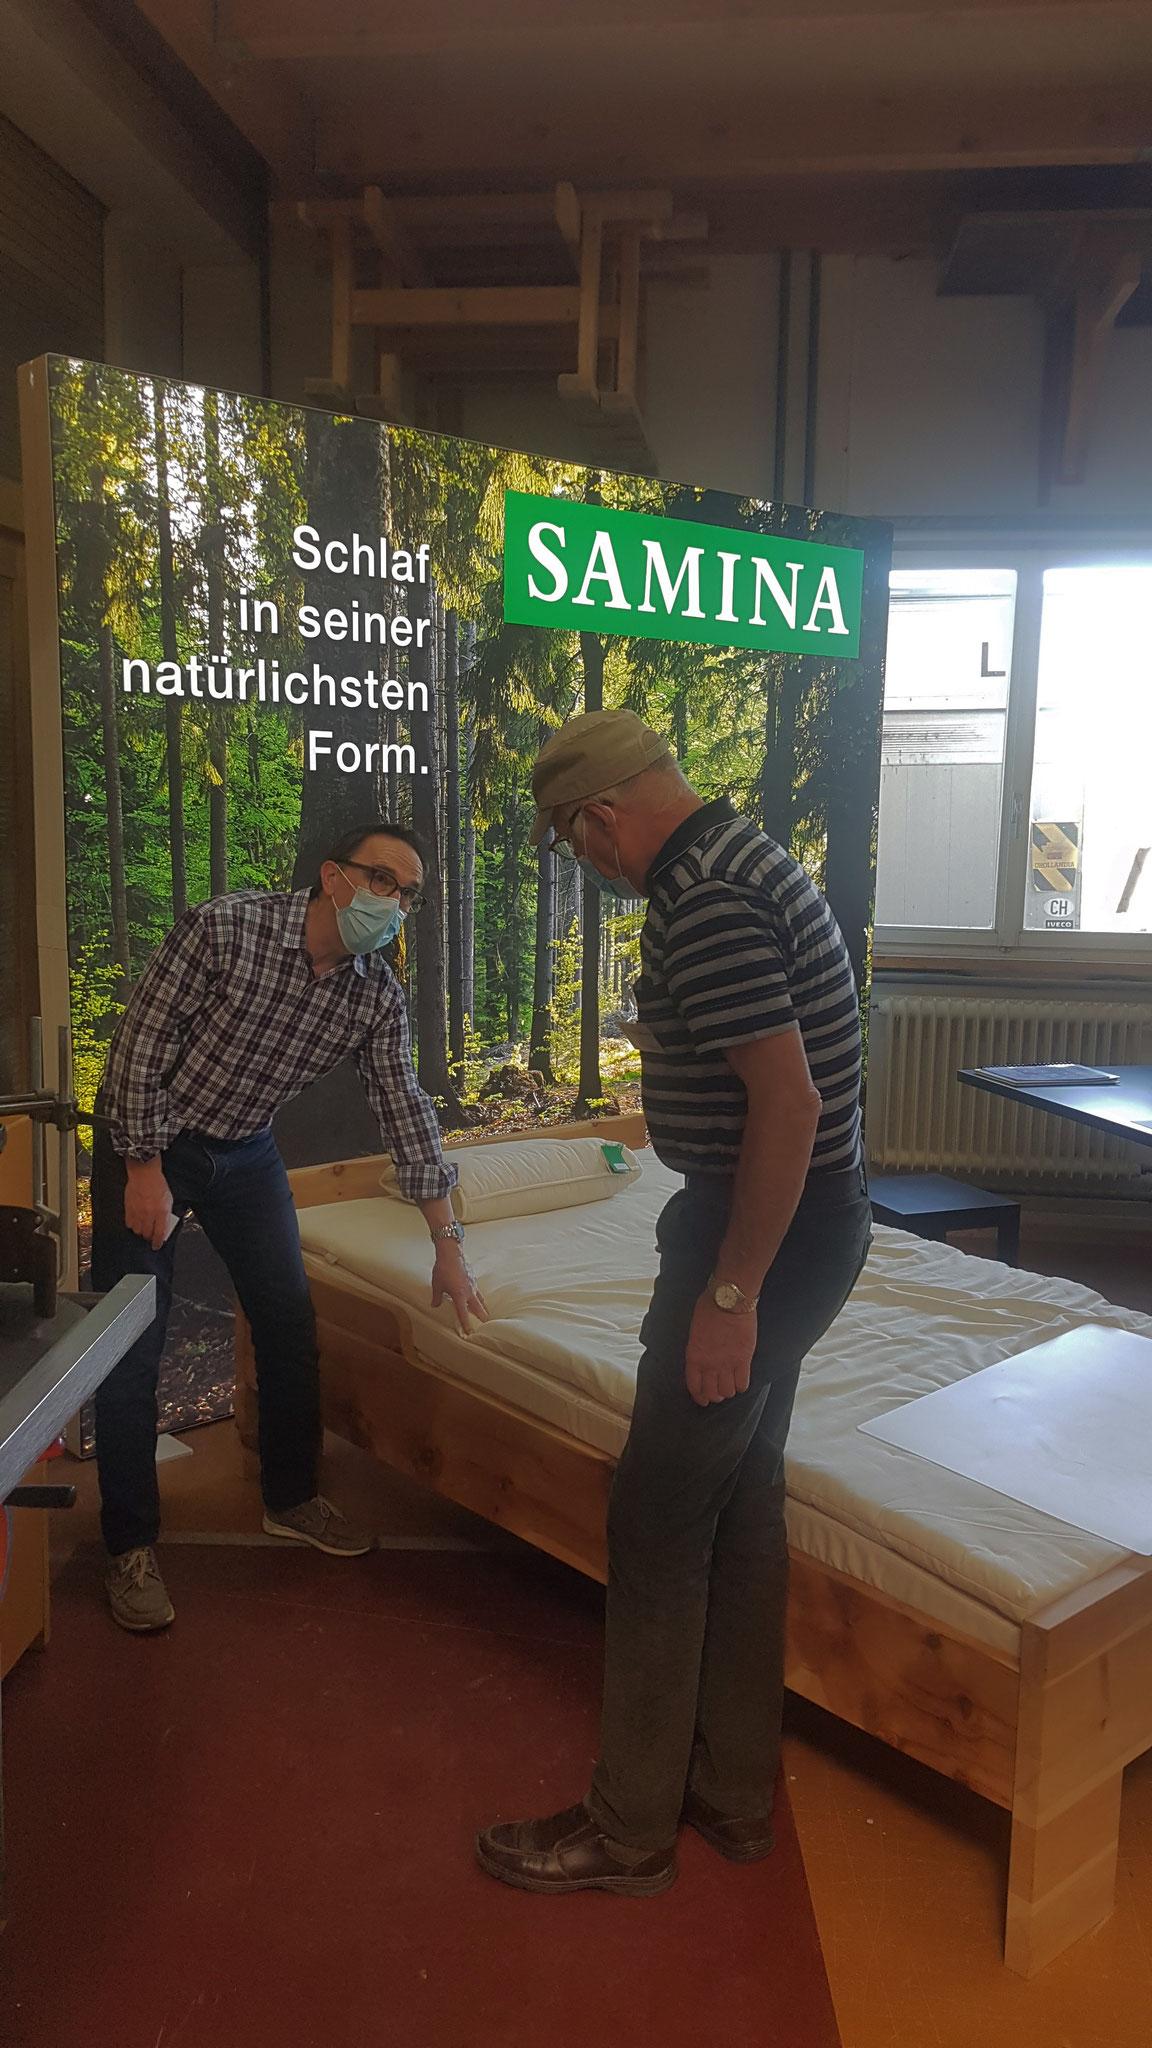 Samina Schlafsystem